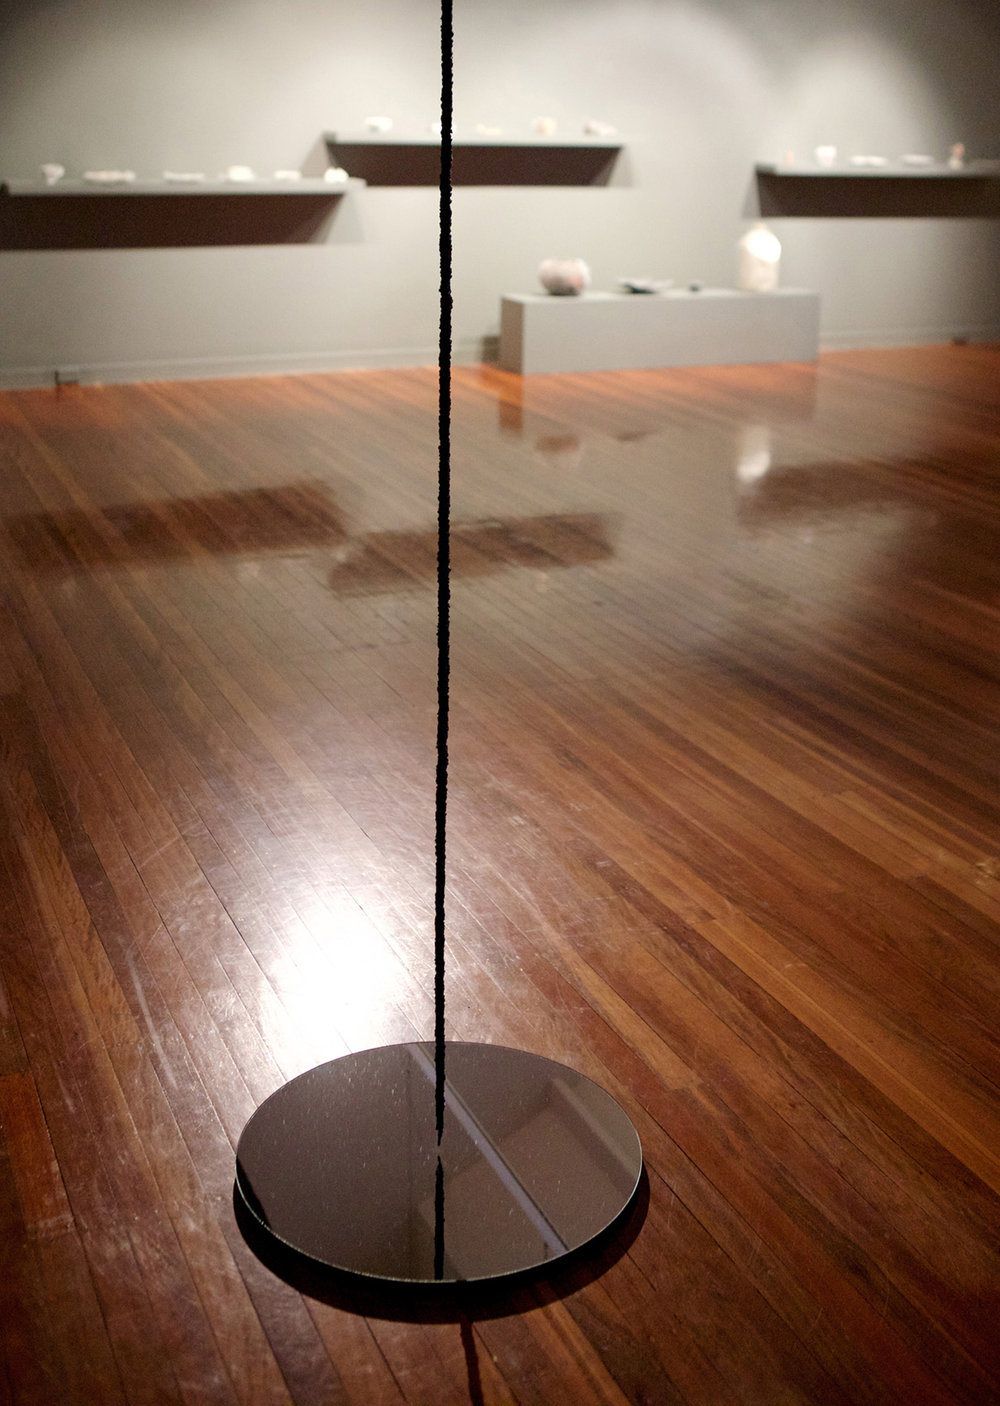 Axis Mundi_Blacktown Arts Centre.jpg